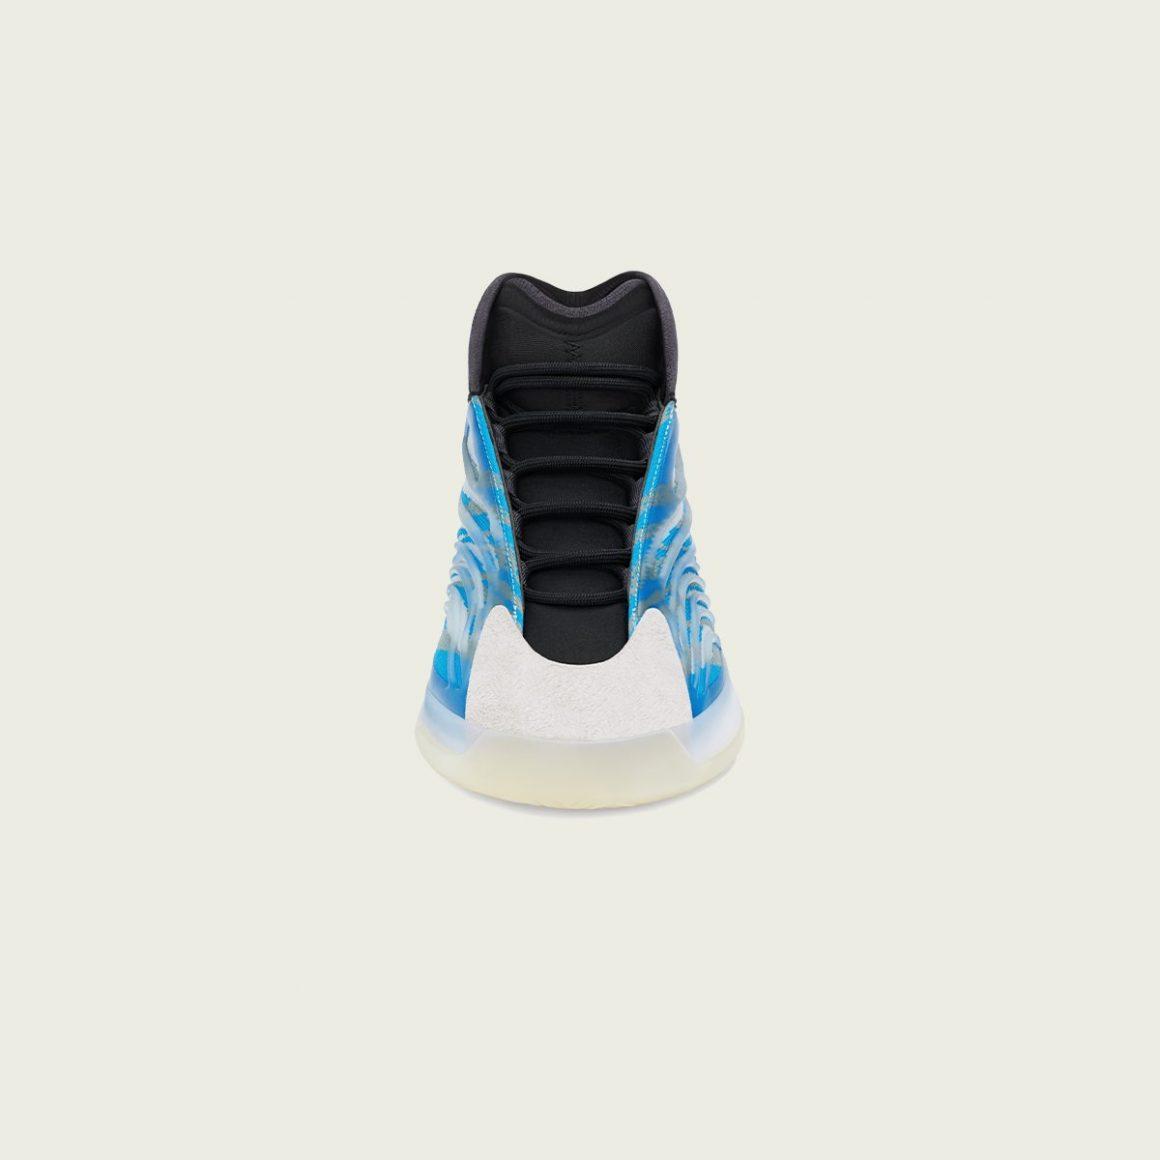 adidas Yeezy QNTM ''Frozen Blue'' - GZ8872